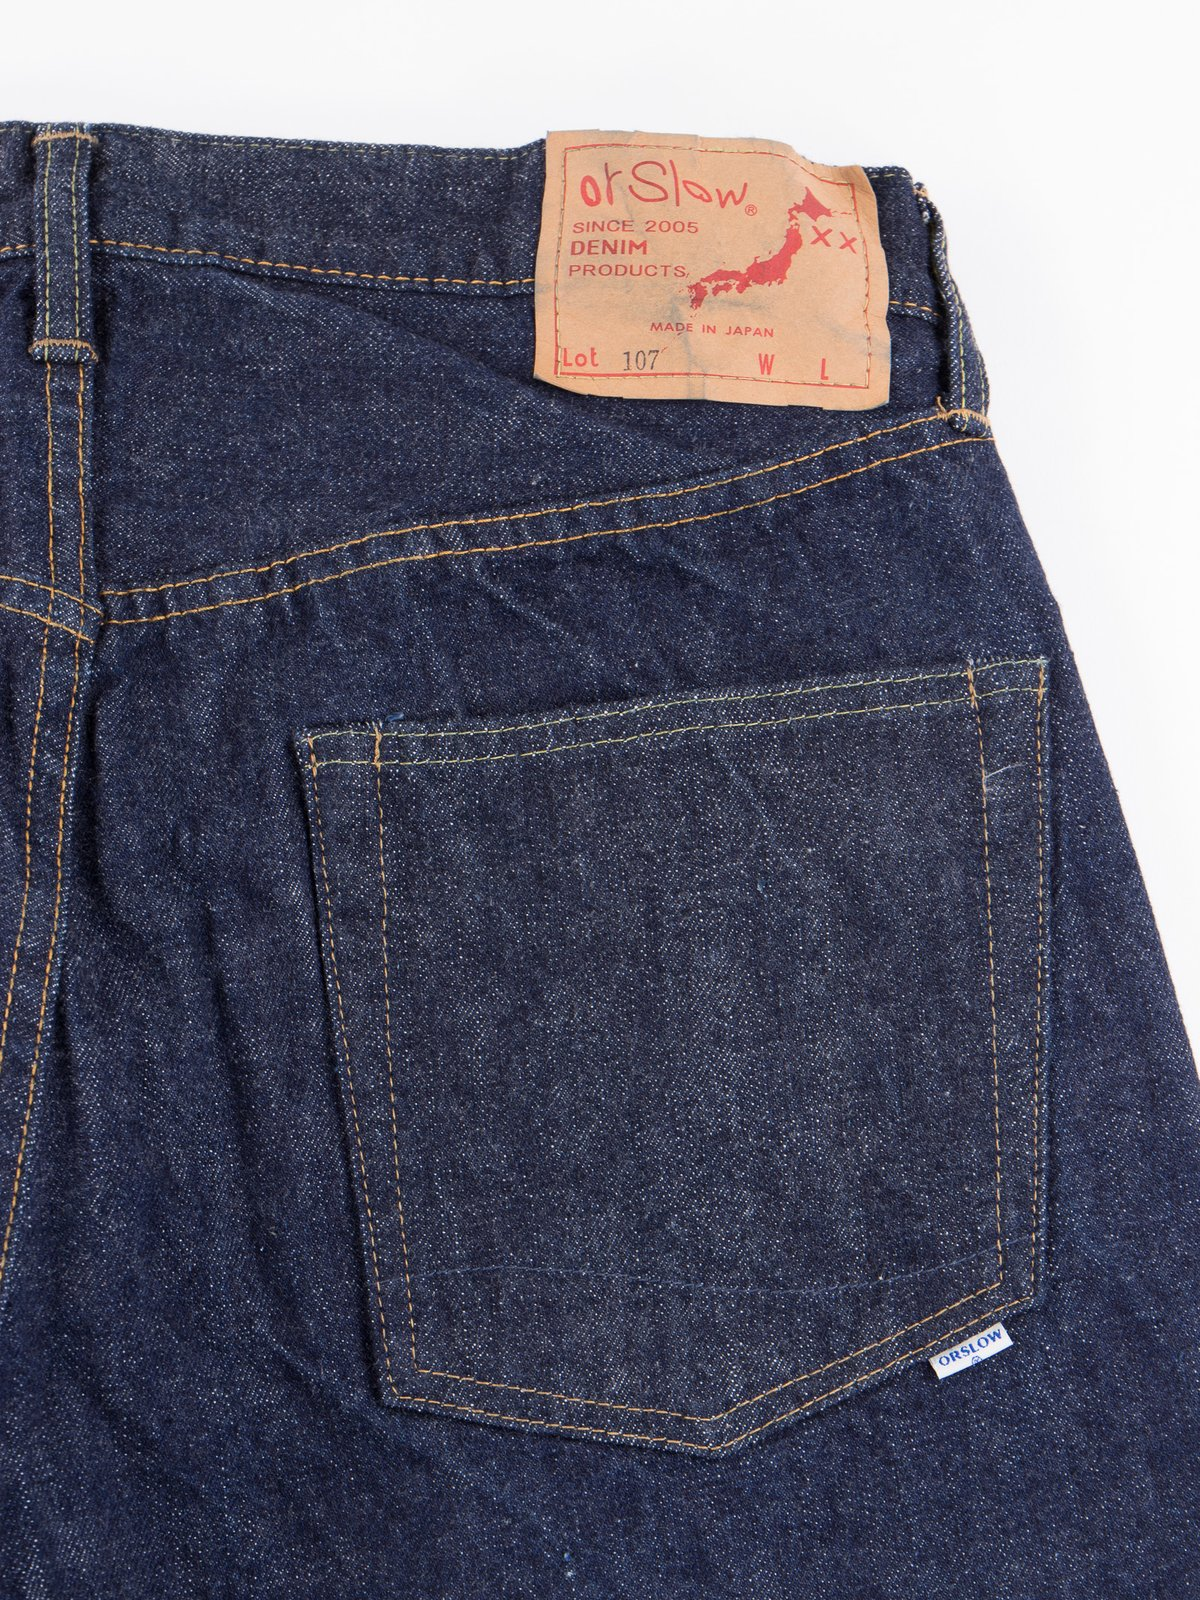 One Wash 107 Slim Fit Jean - Image 6